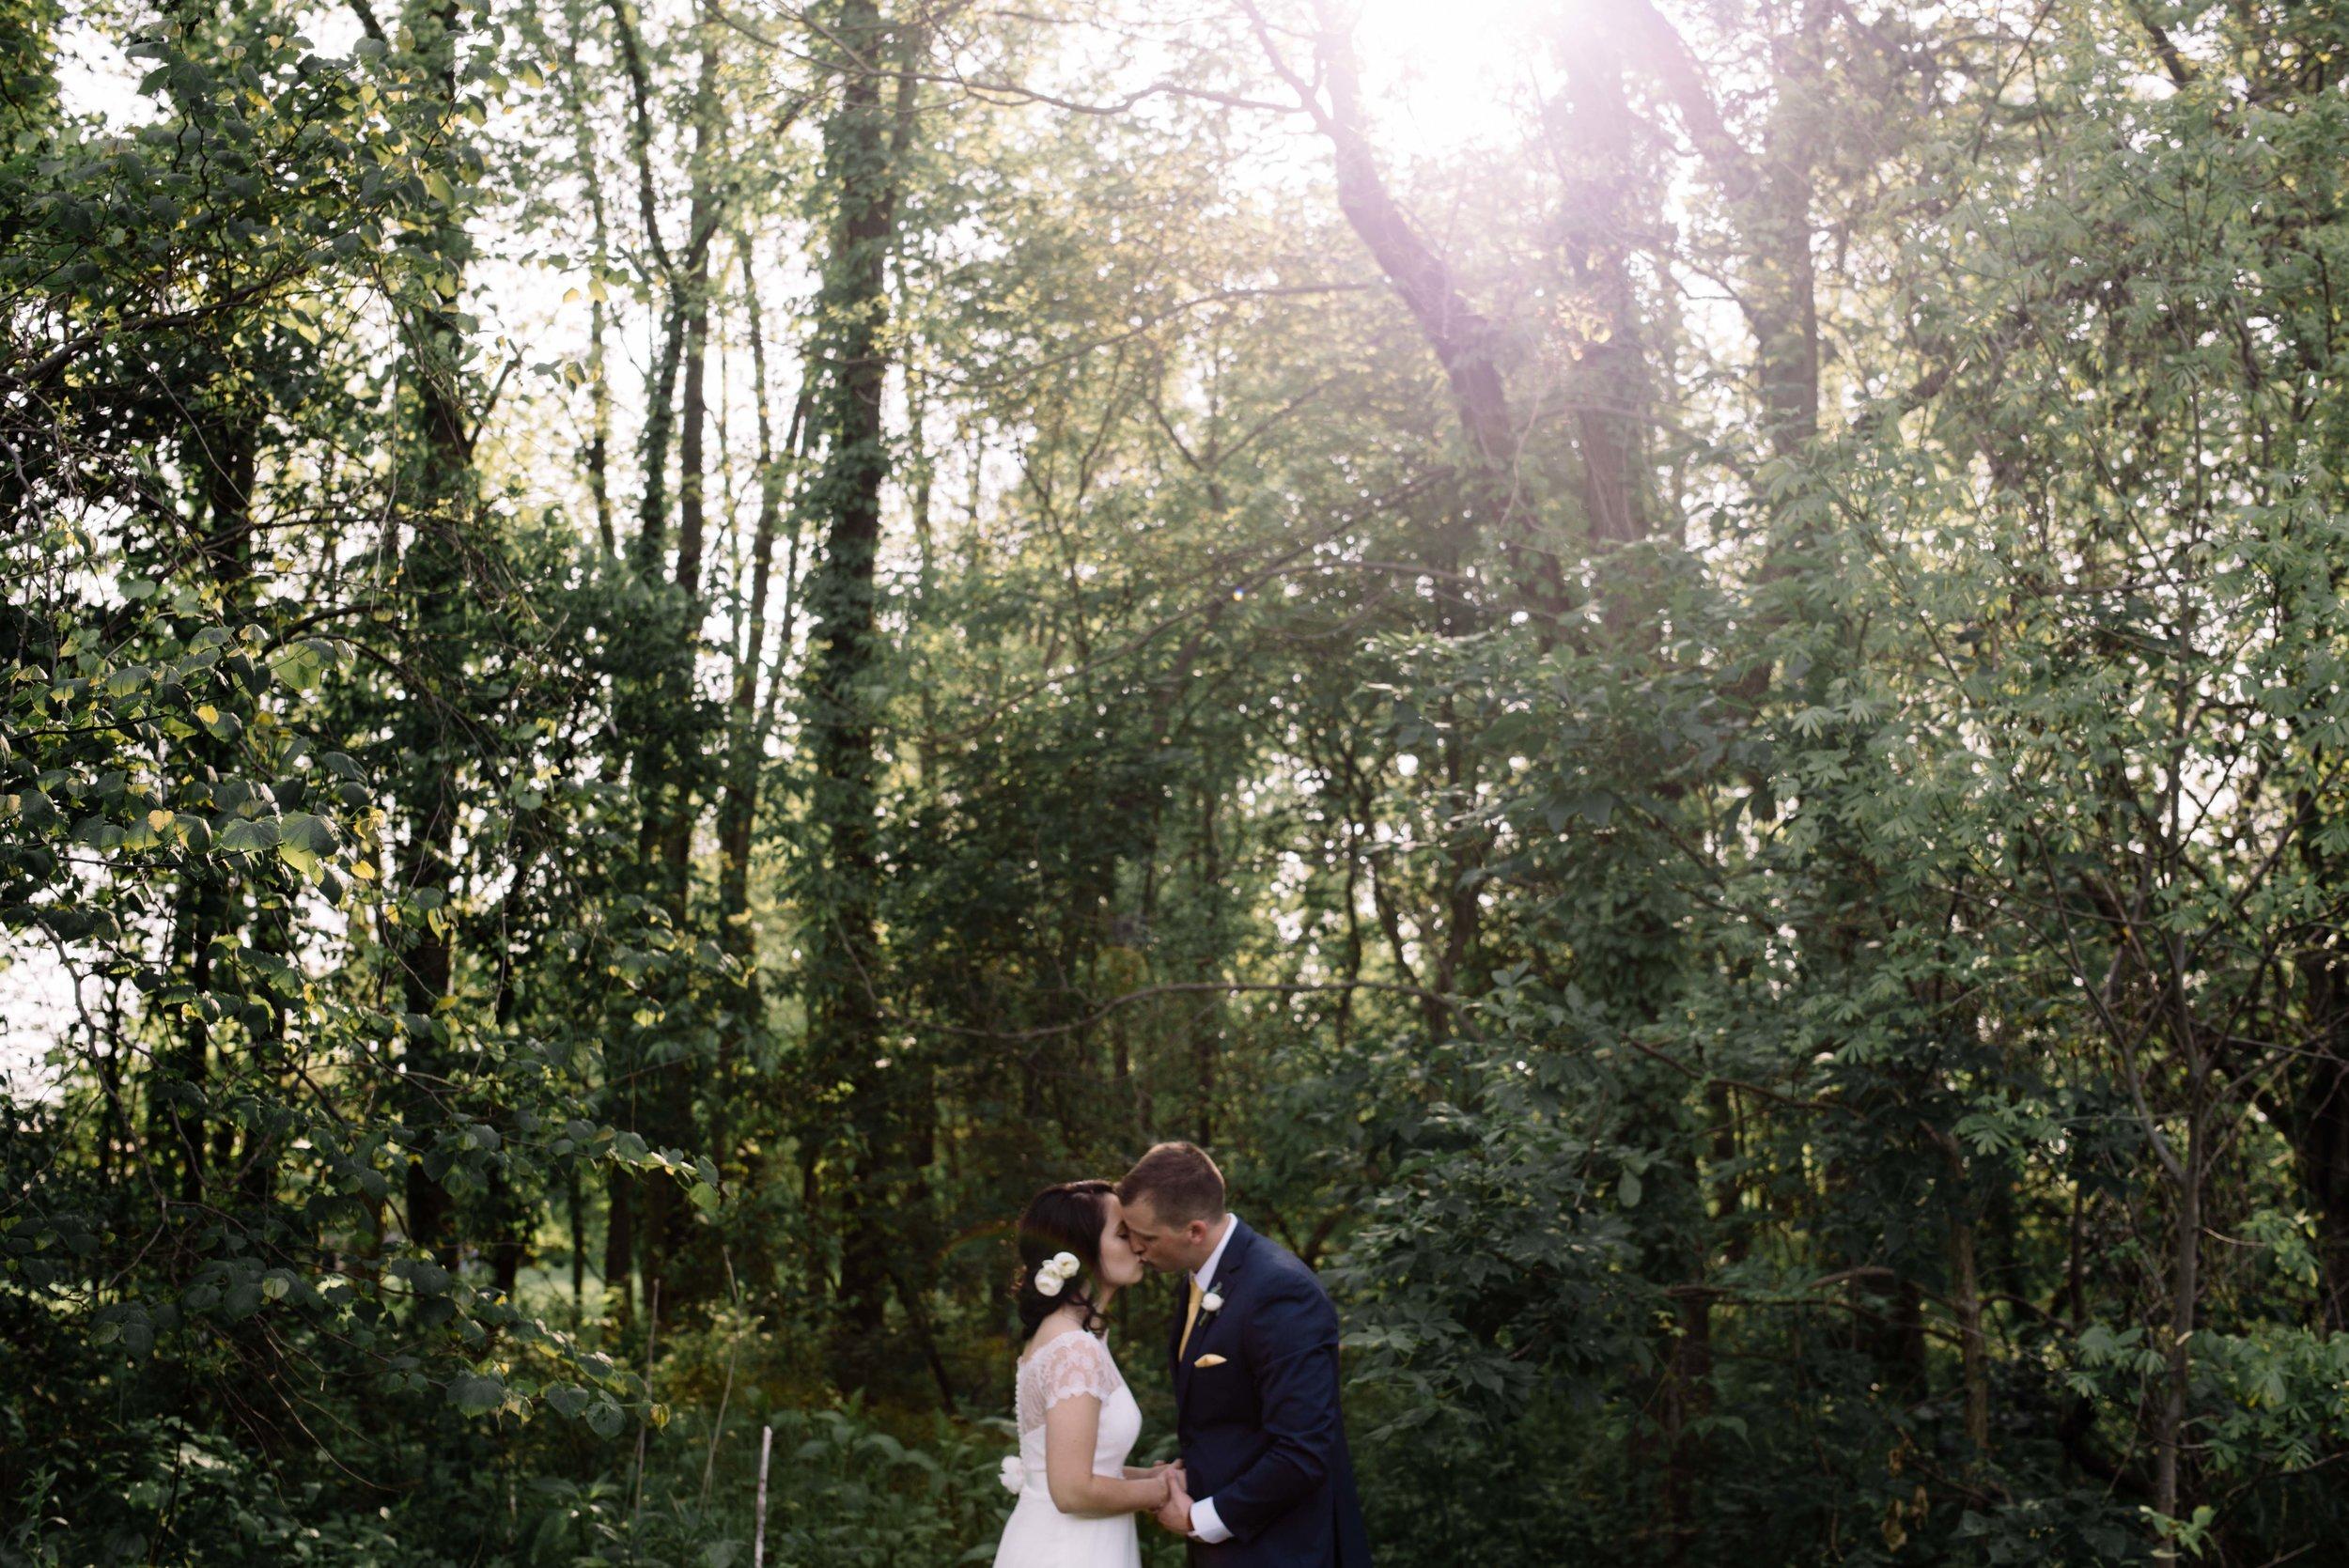 Ana-Dan-Blog-Indianapolis-Wedding-63.jpg